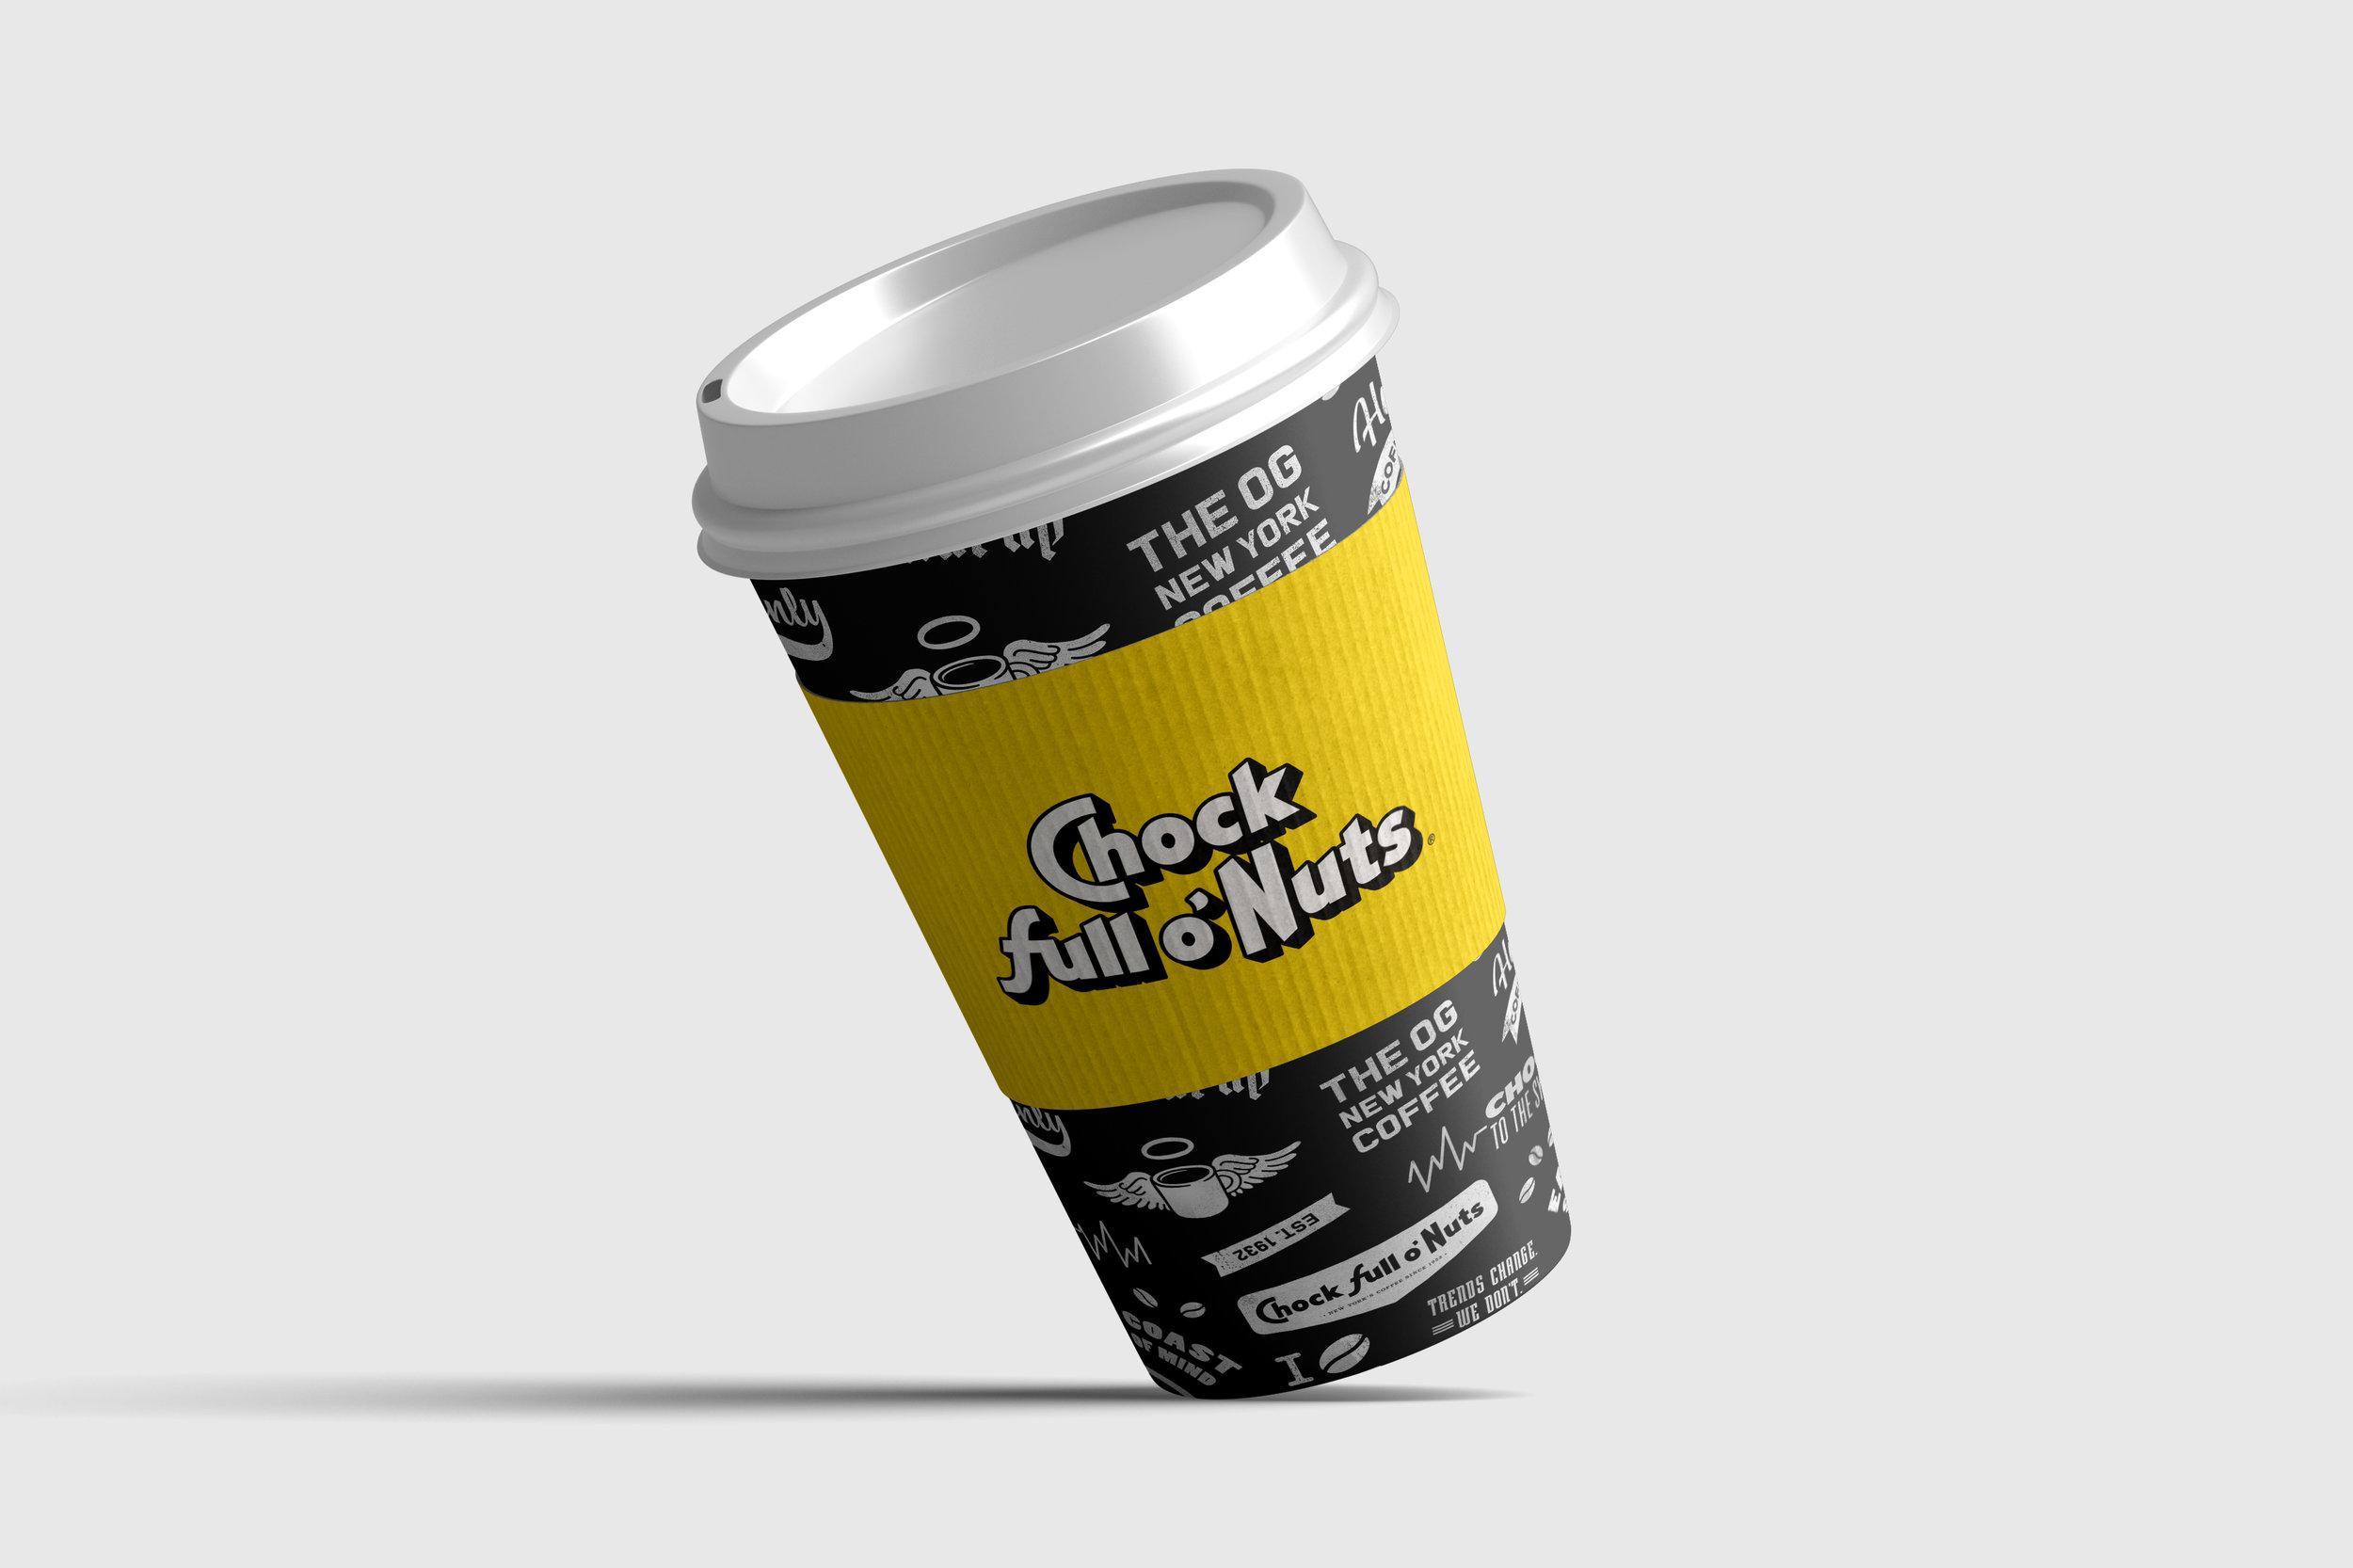 6_Cup1.jpg